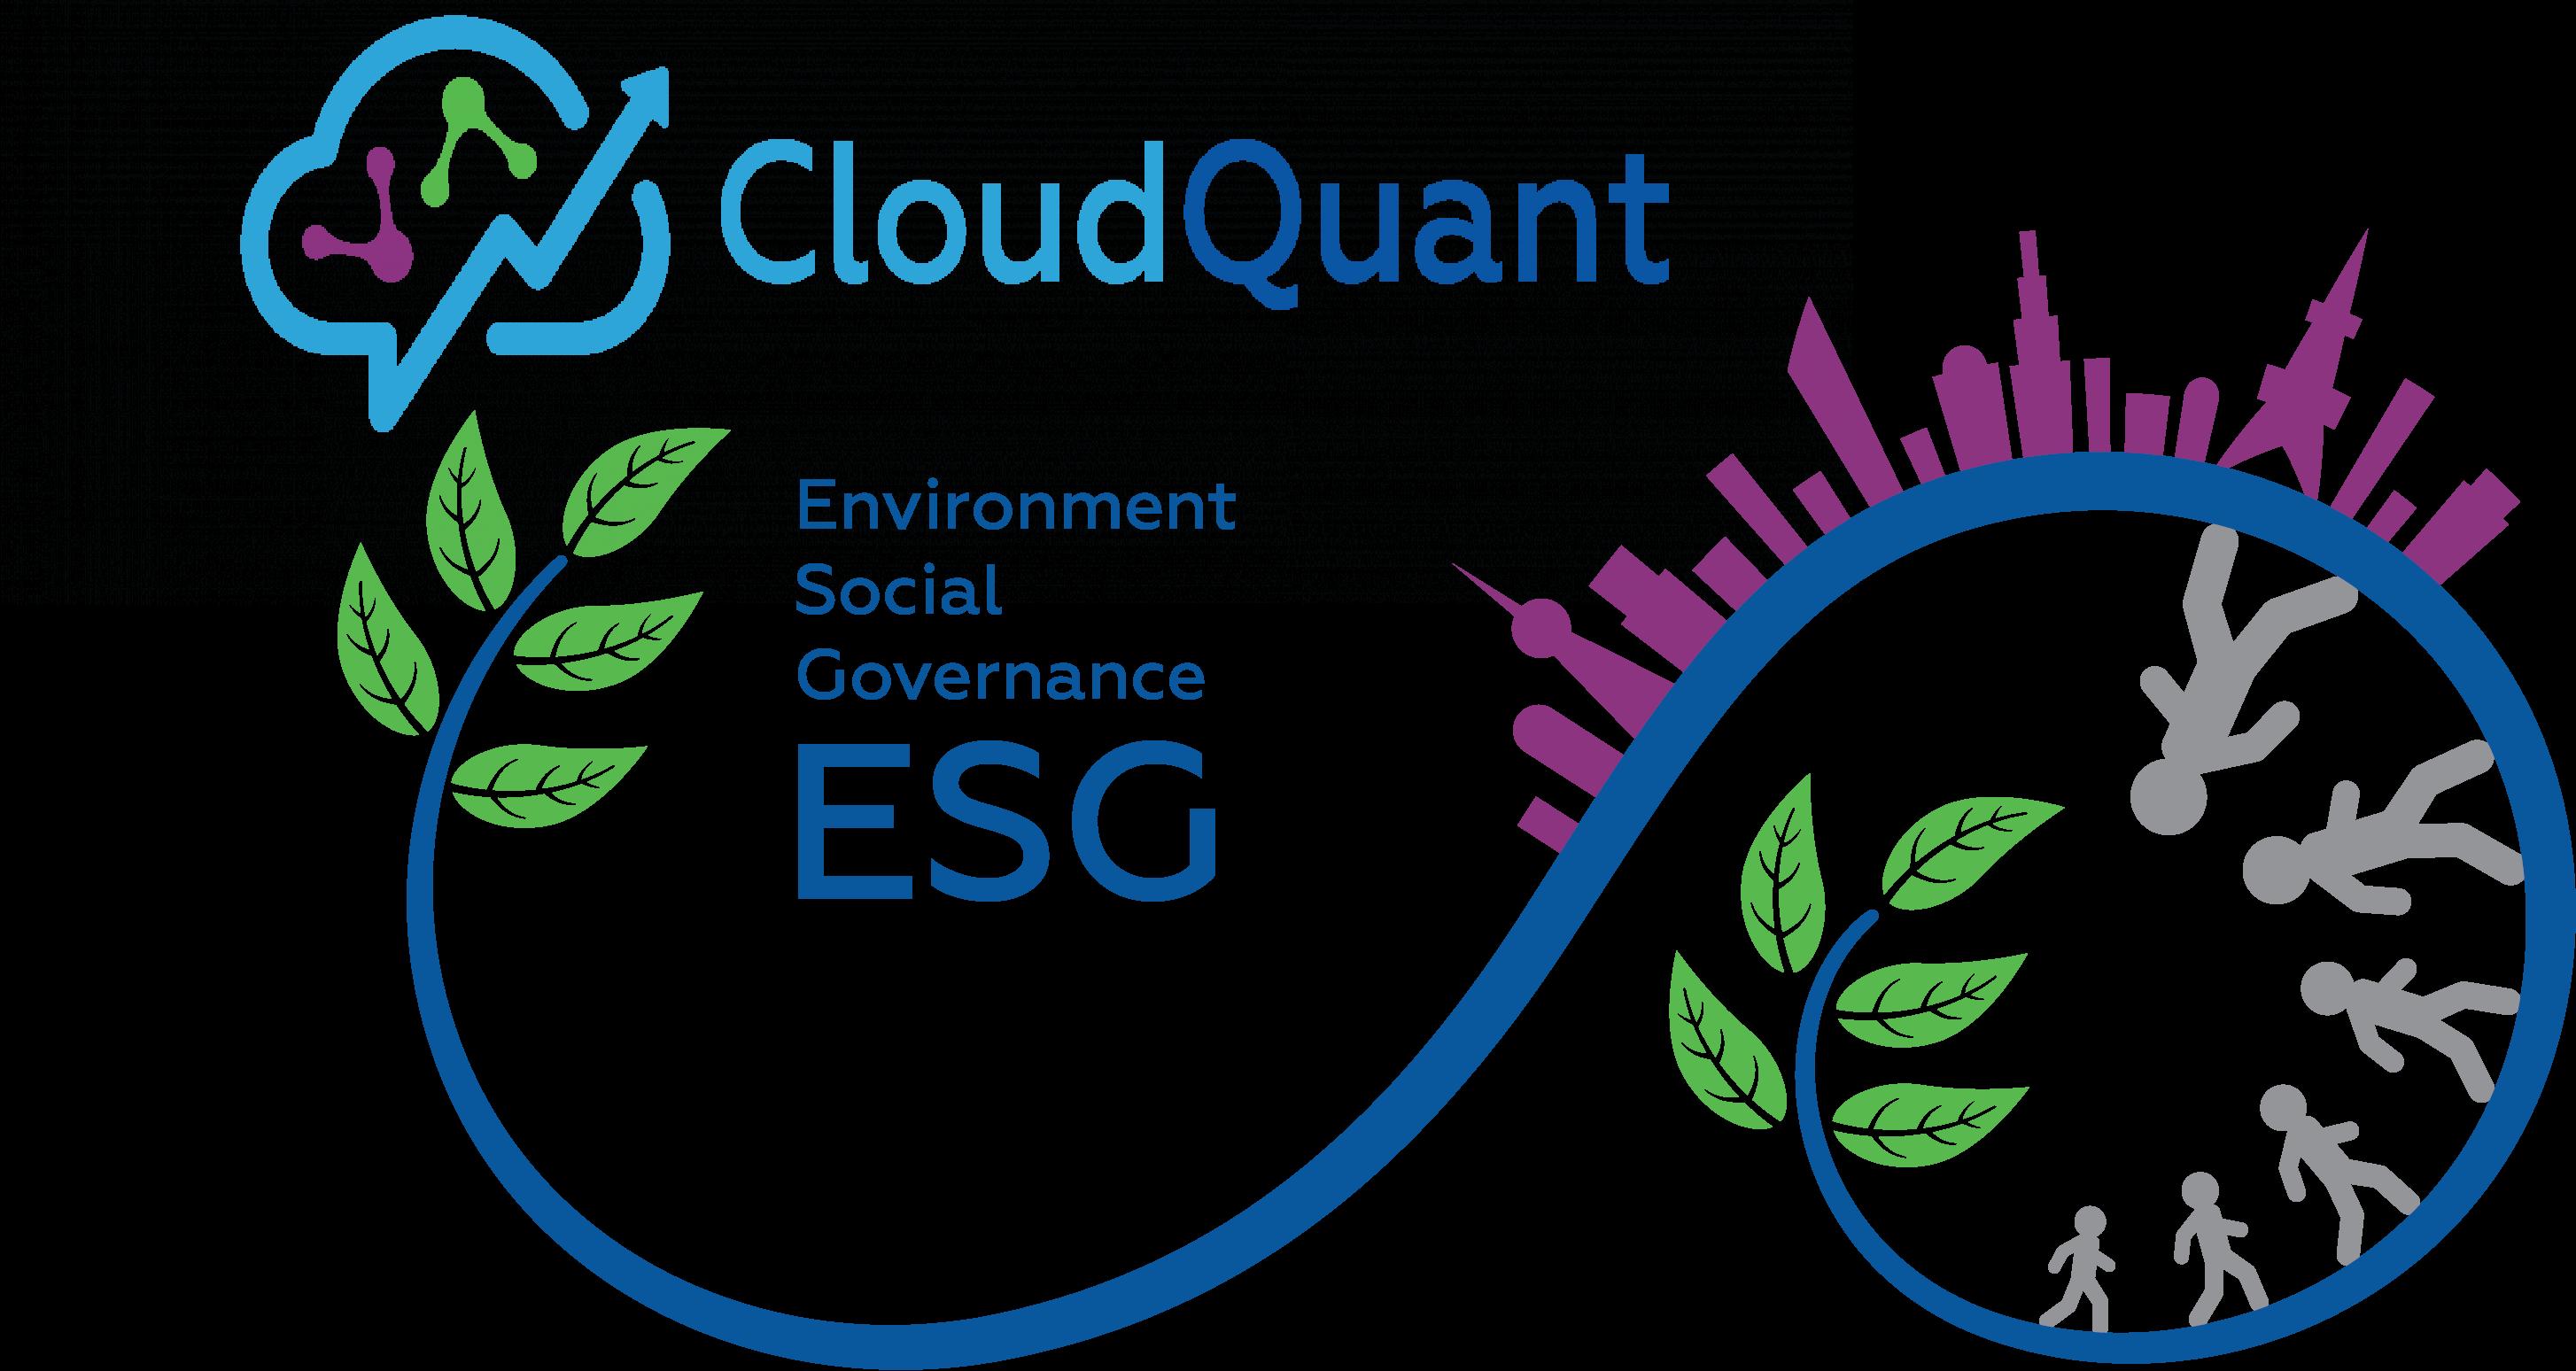 Crux Summit on Data & Sustainability